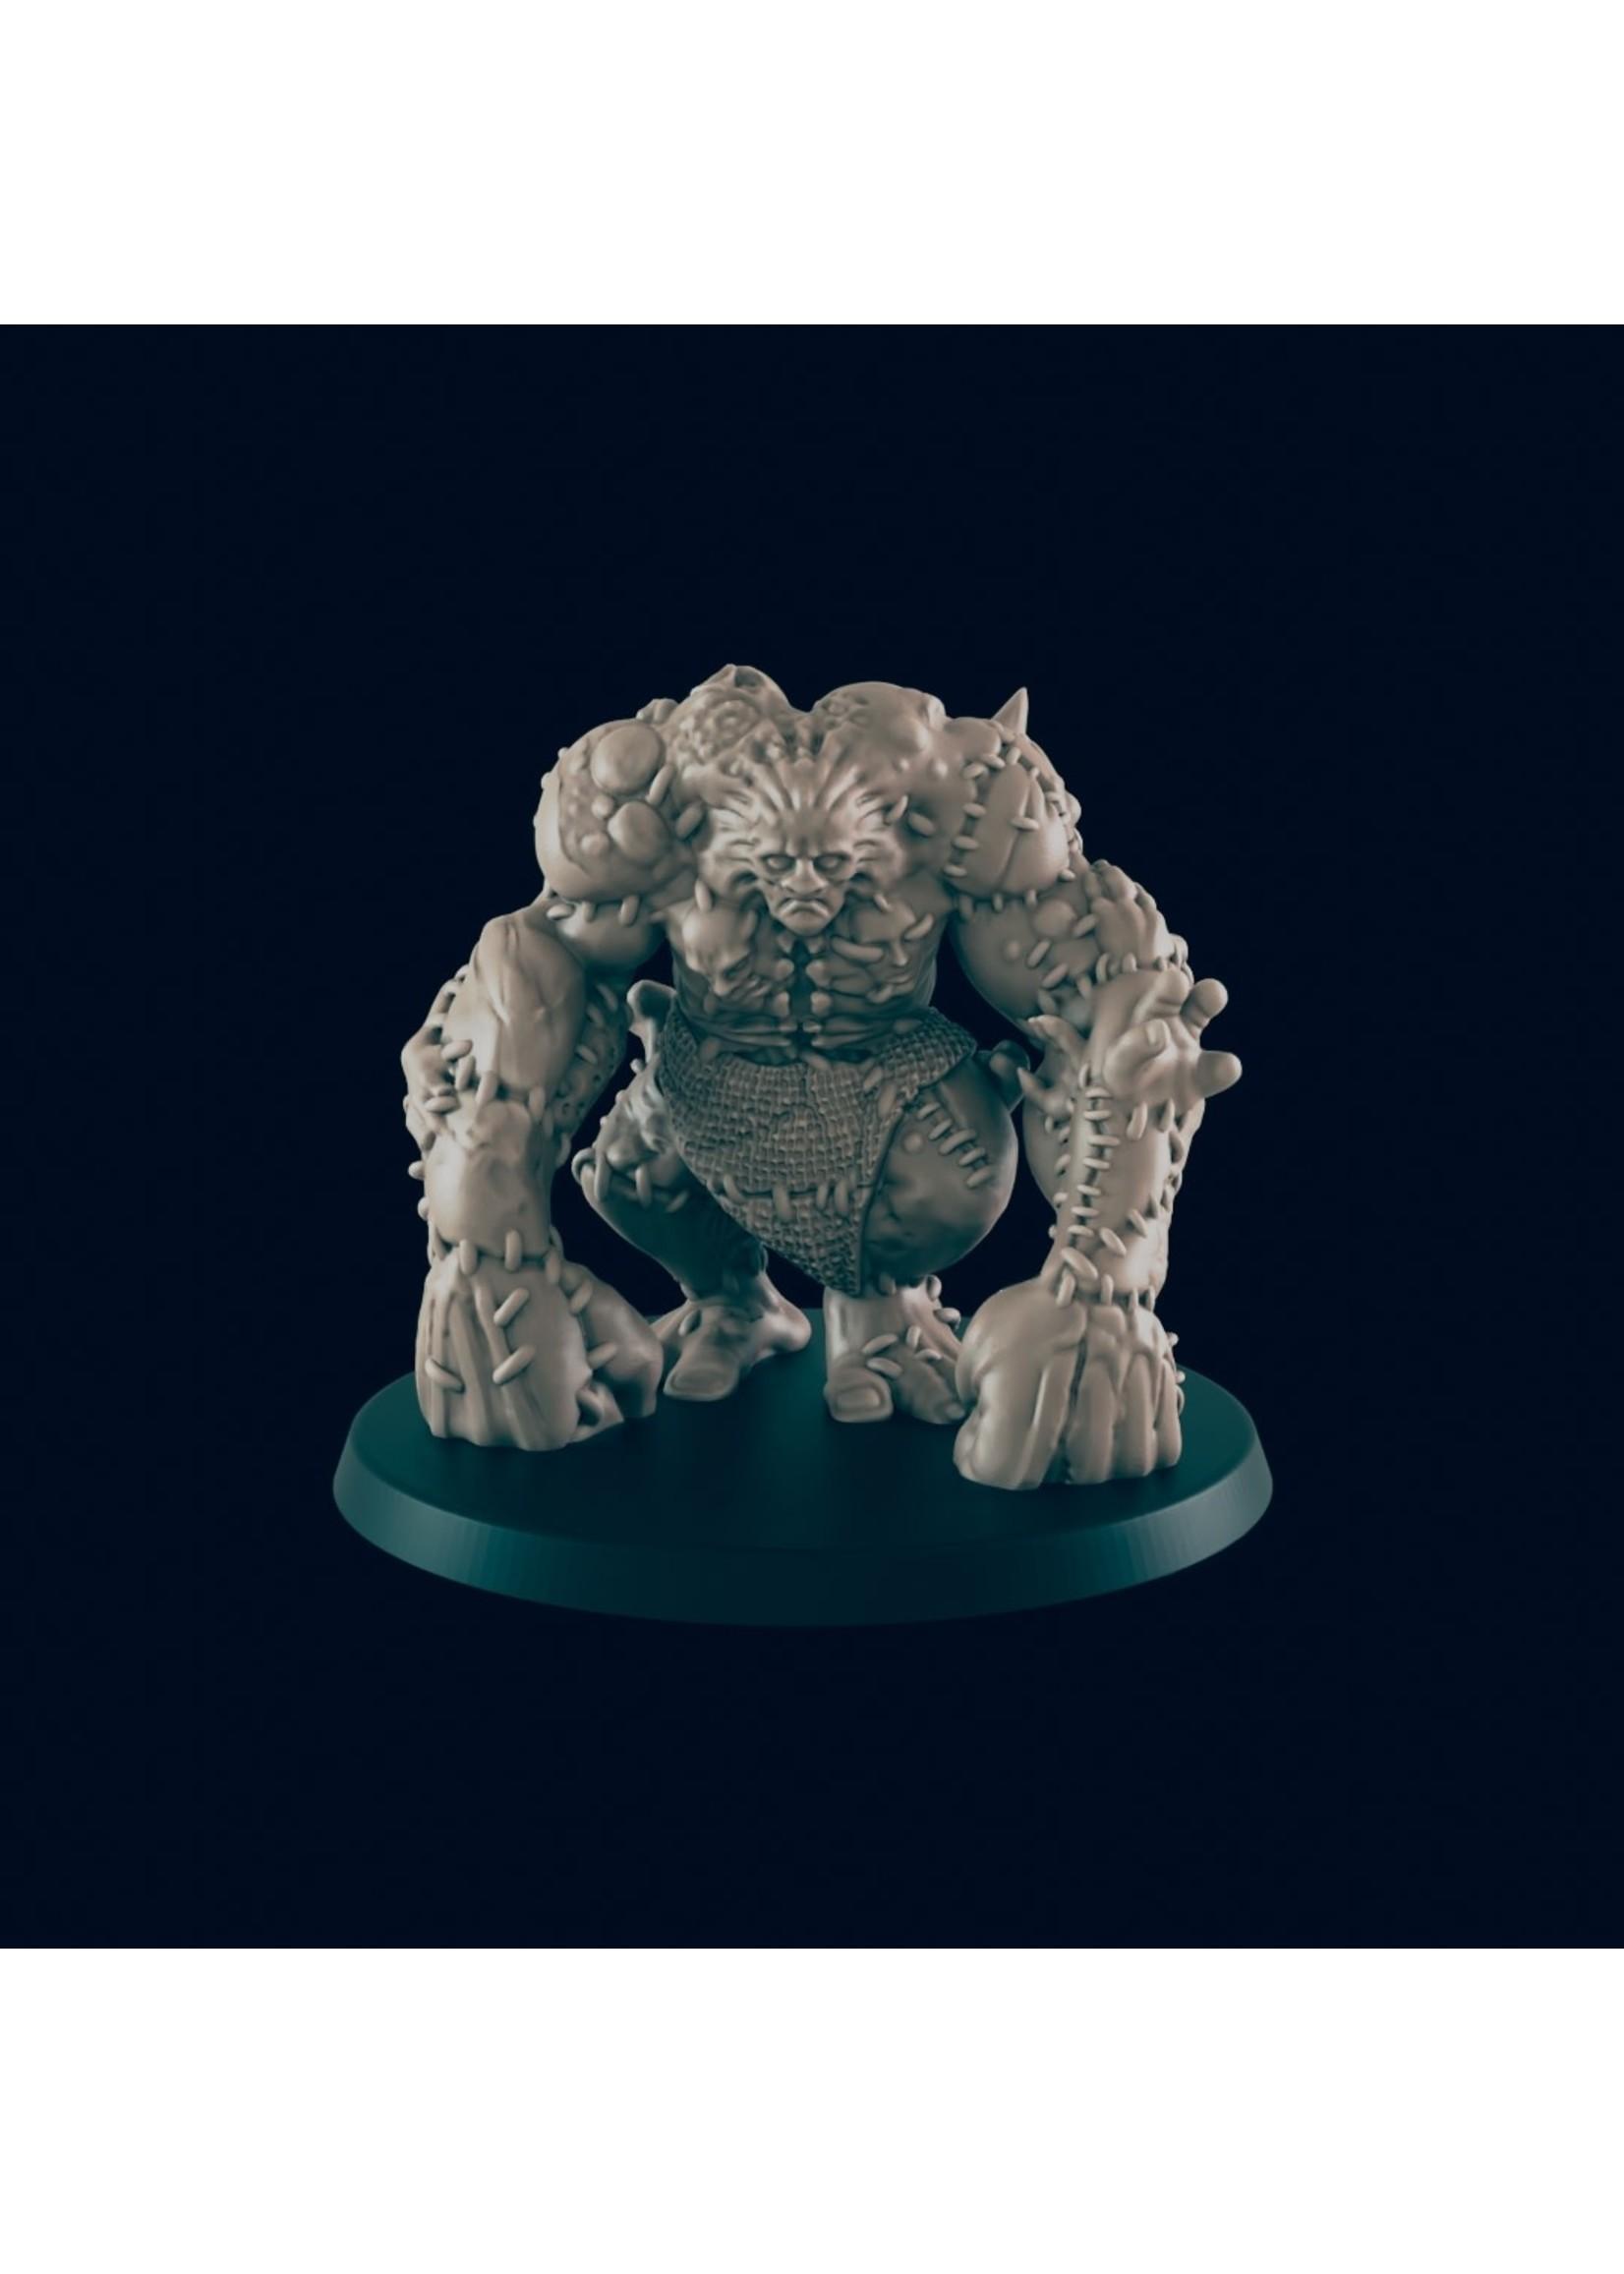 3D Printed Miniature - Flesh Golem - Dungeons & Dragons - Beasts and Baddies KS